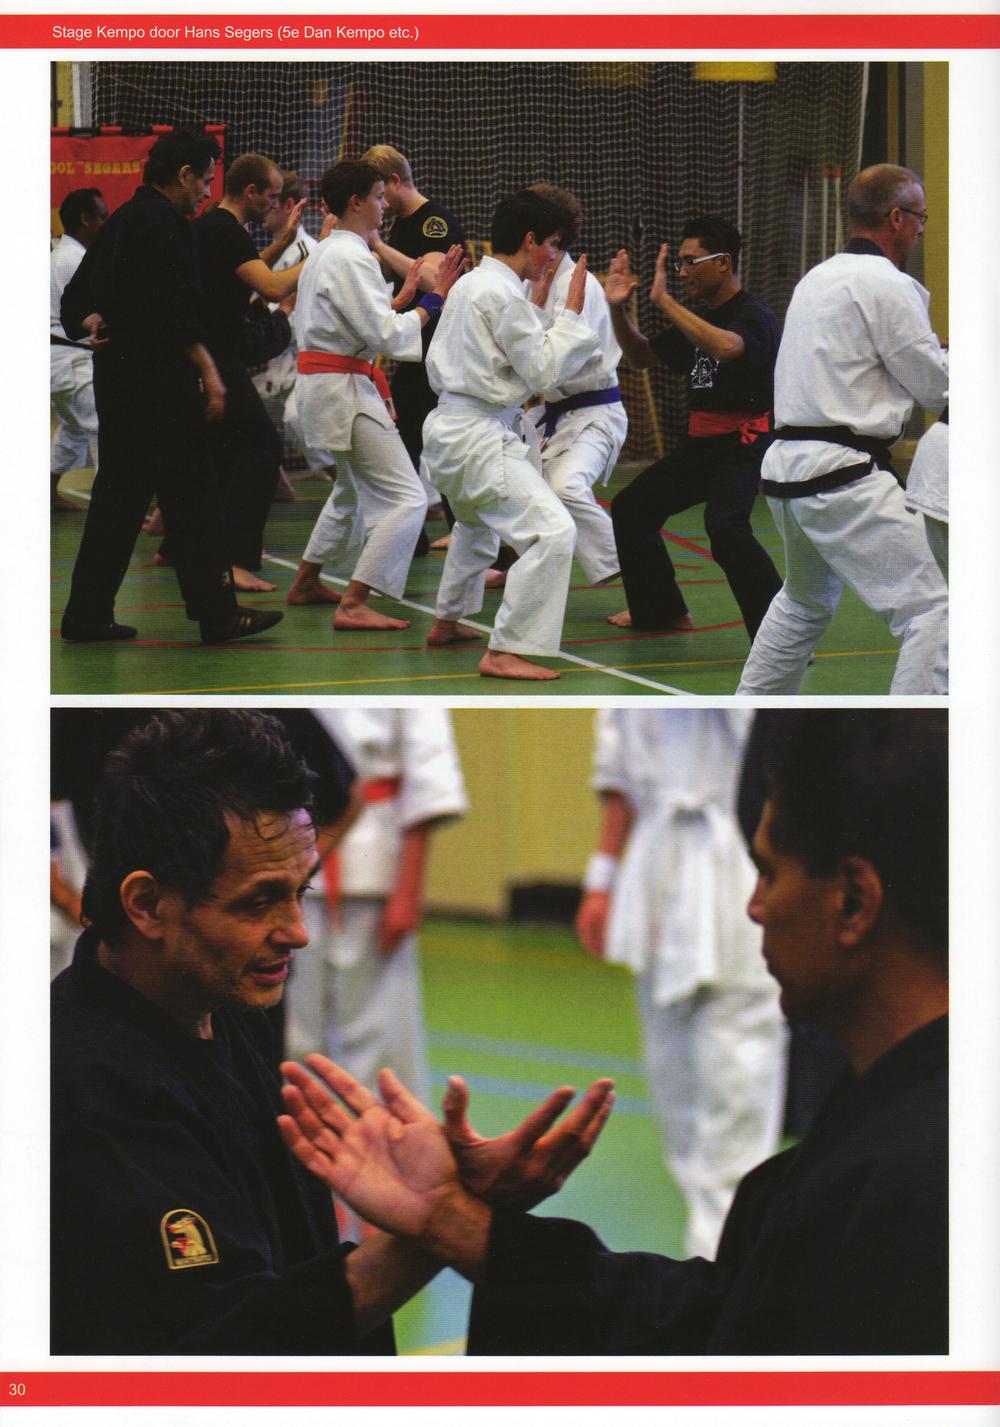 2012-11-04 NFK 7 Masters Martial Arts Festival Fotomagazine 2012 Pagina 30.jpg